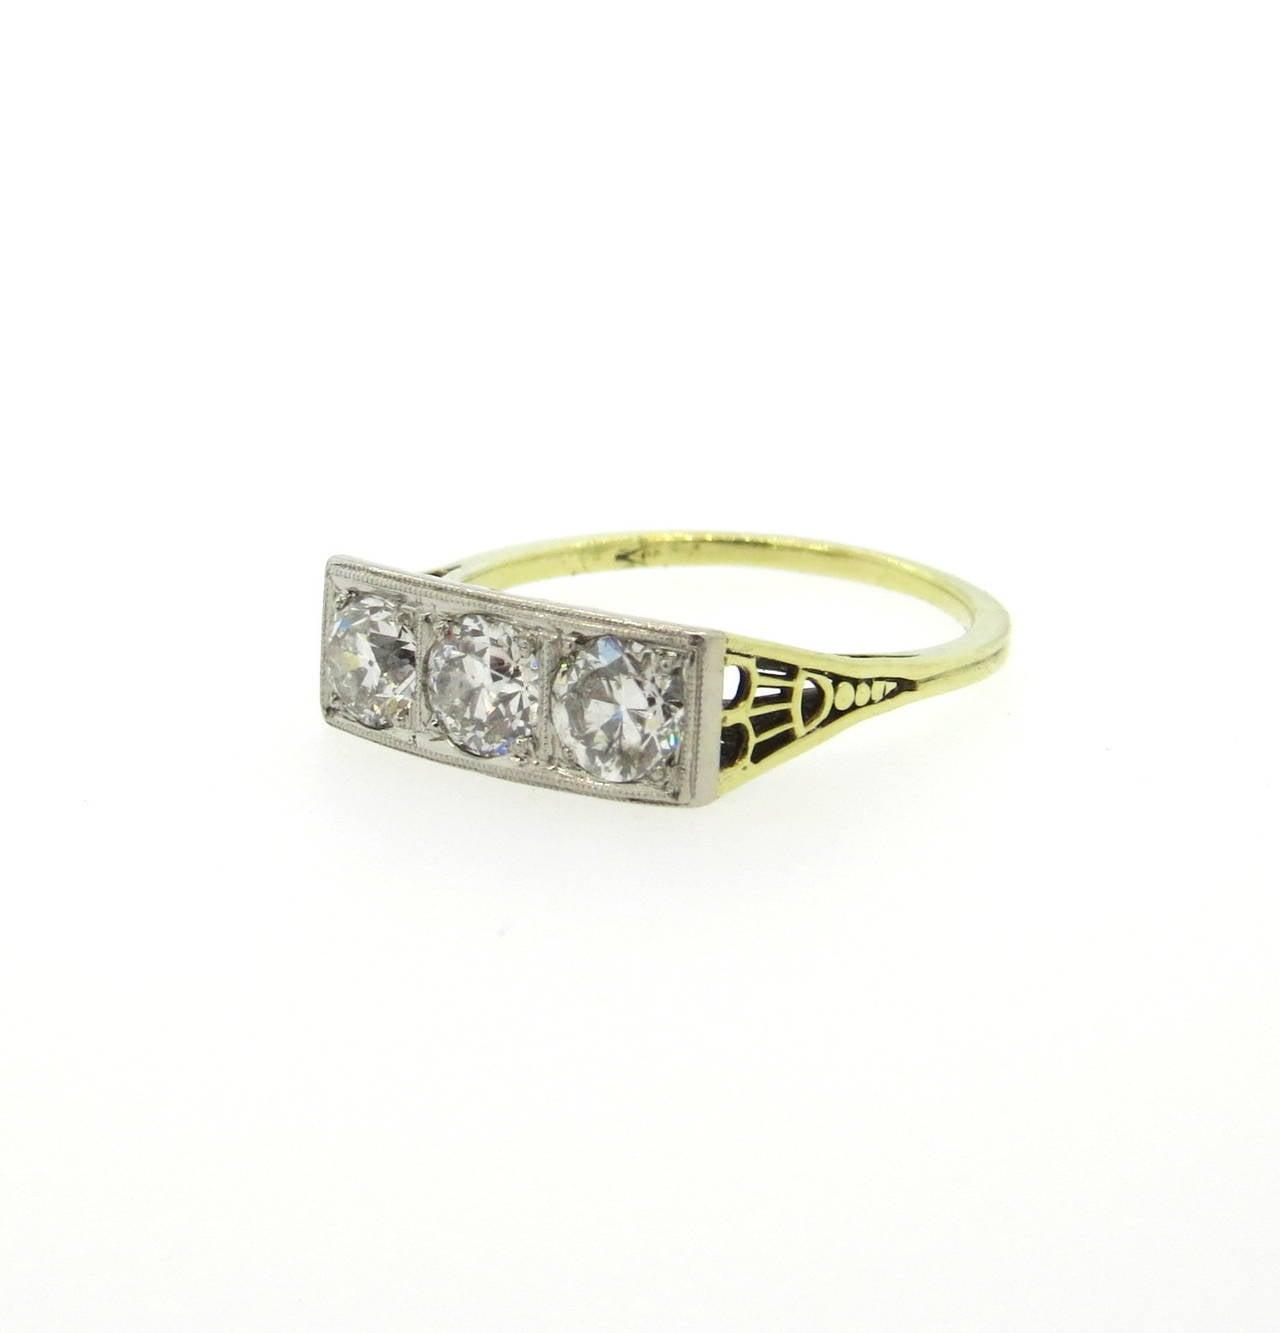 1920s deco gold three ring at 1stdibs